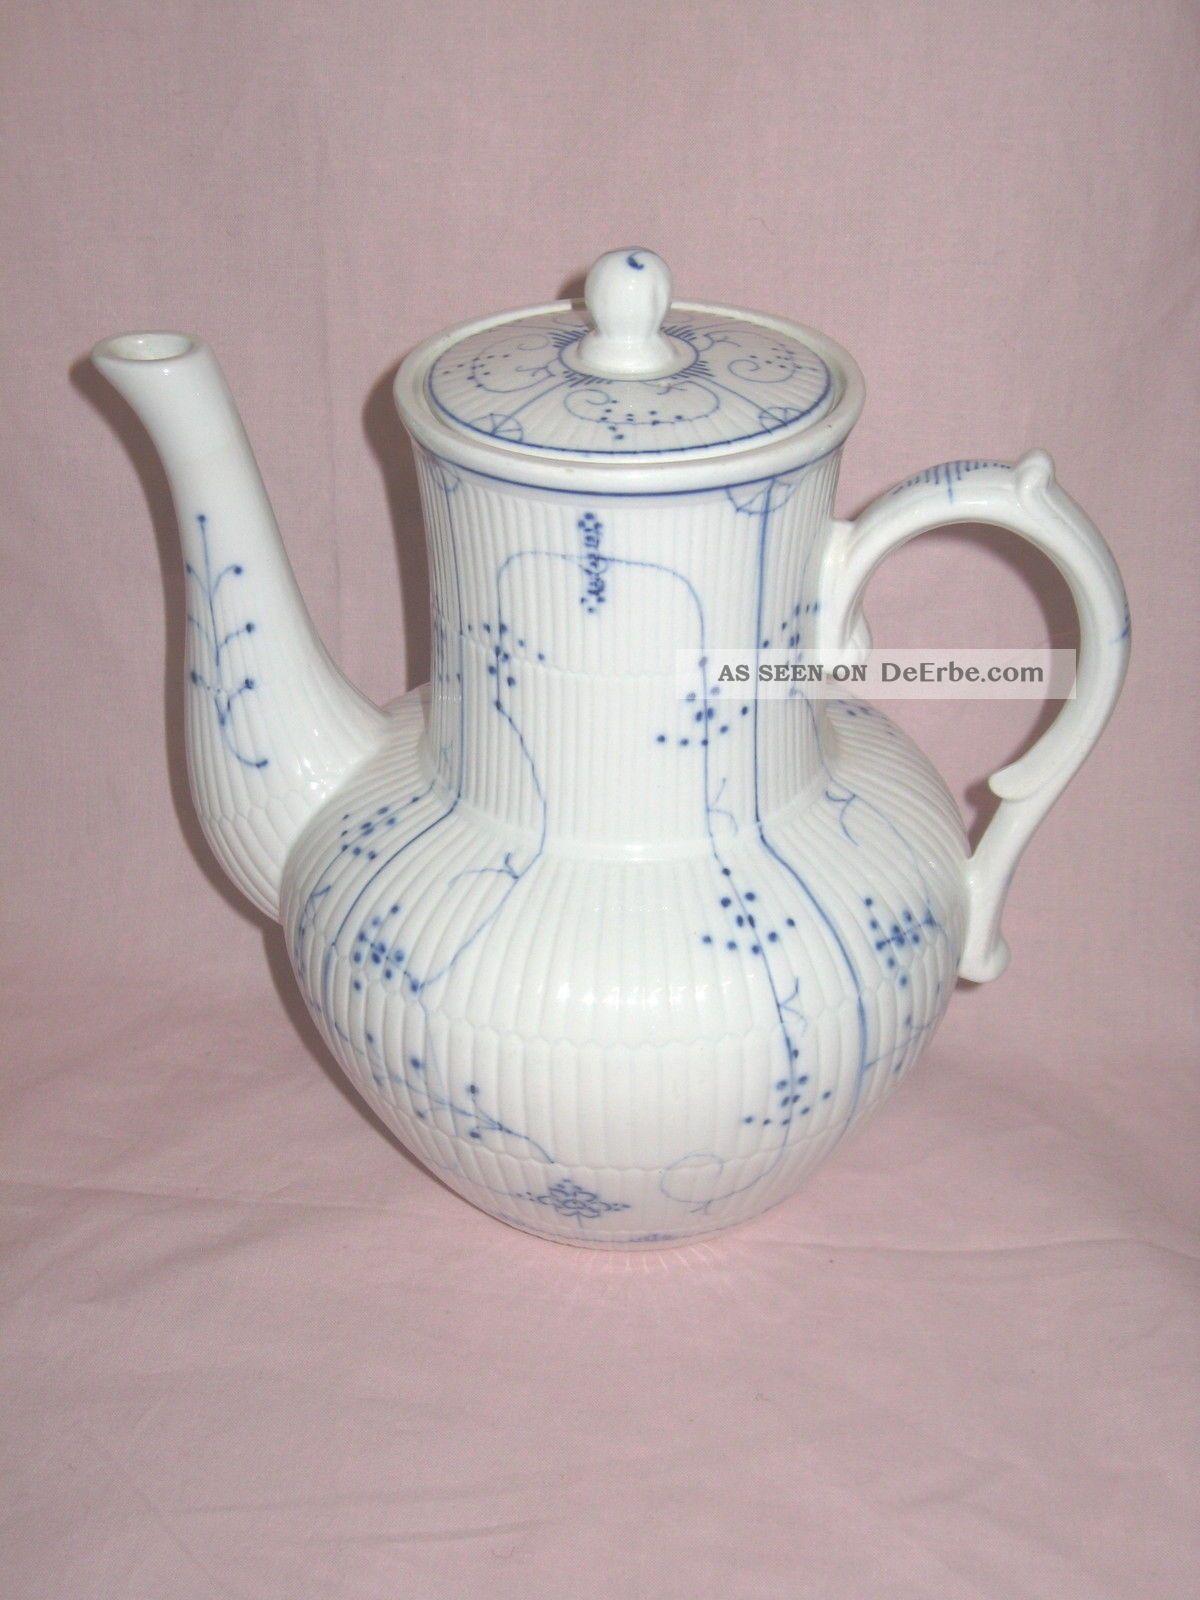 villeroy boch dresden kaffeekanne indisch blau strohblume ca 1890 1920 alt. Black Bedroom Furniture Sets. Home Design Ideas